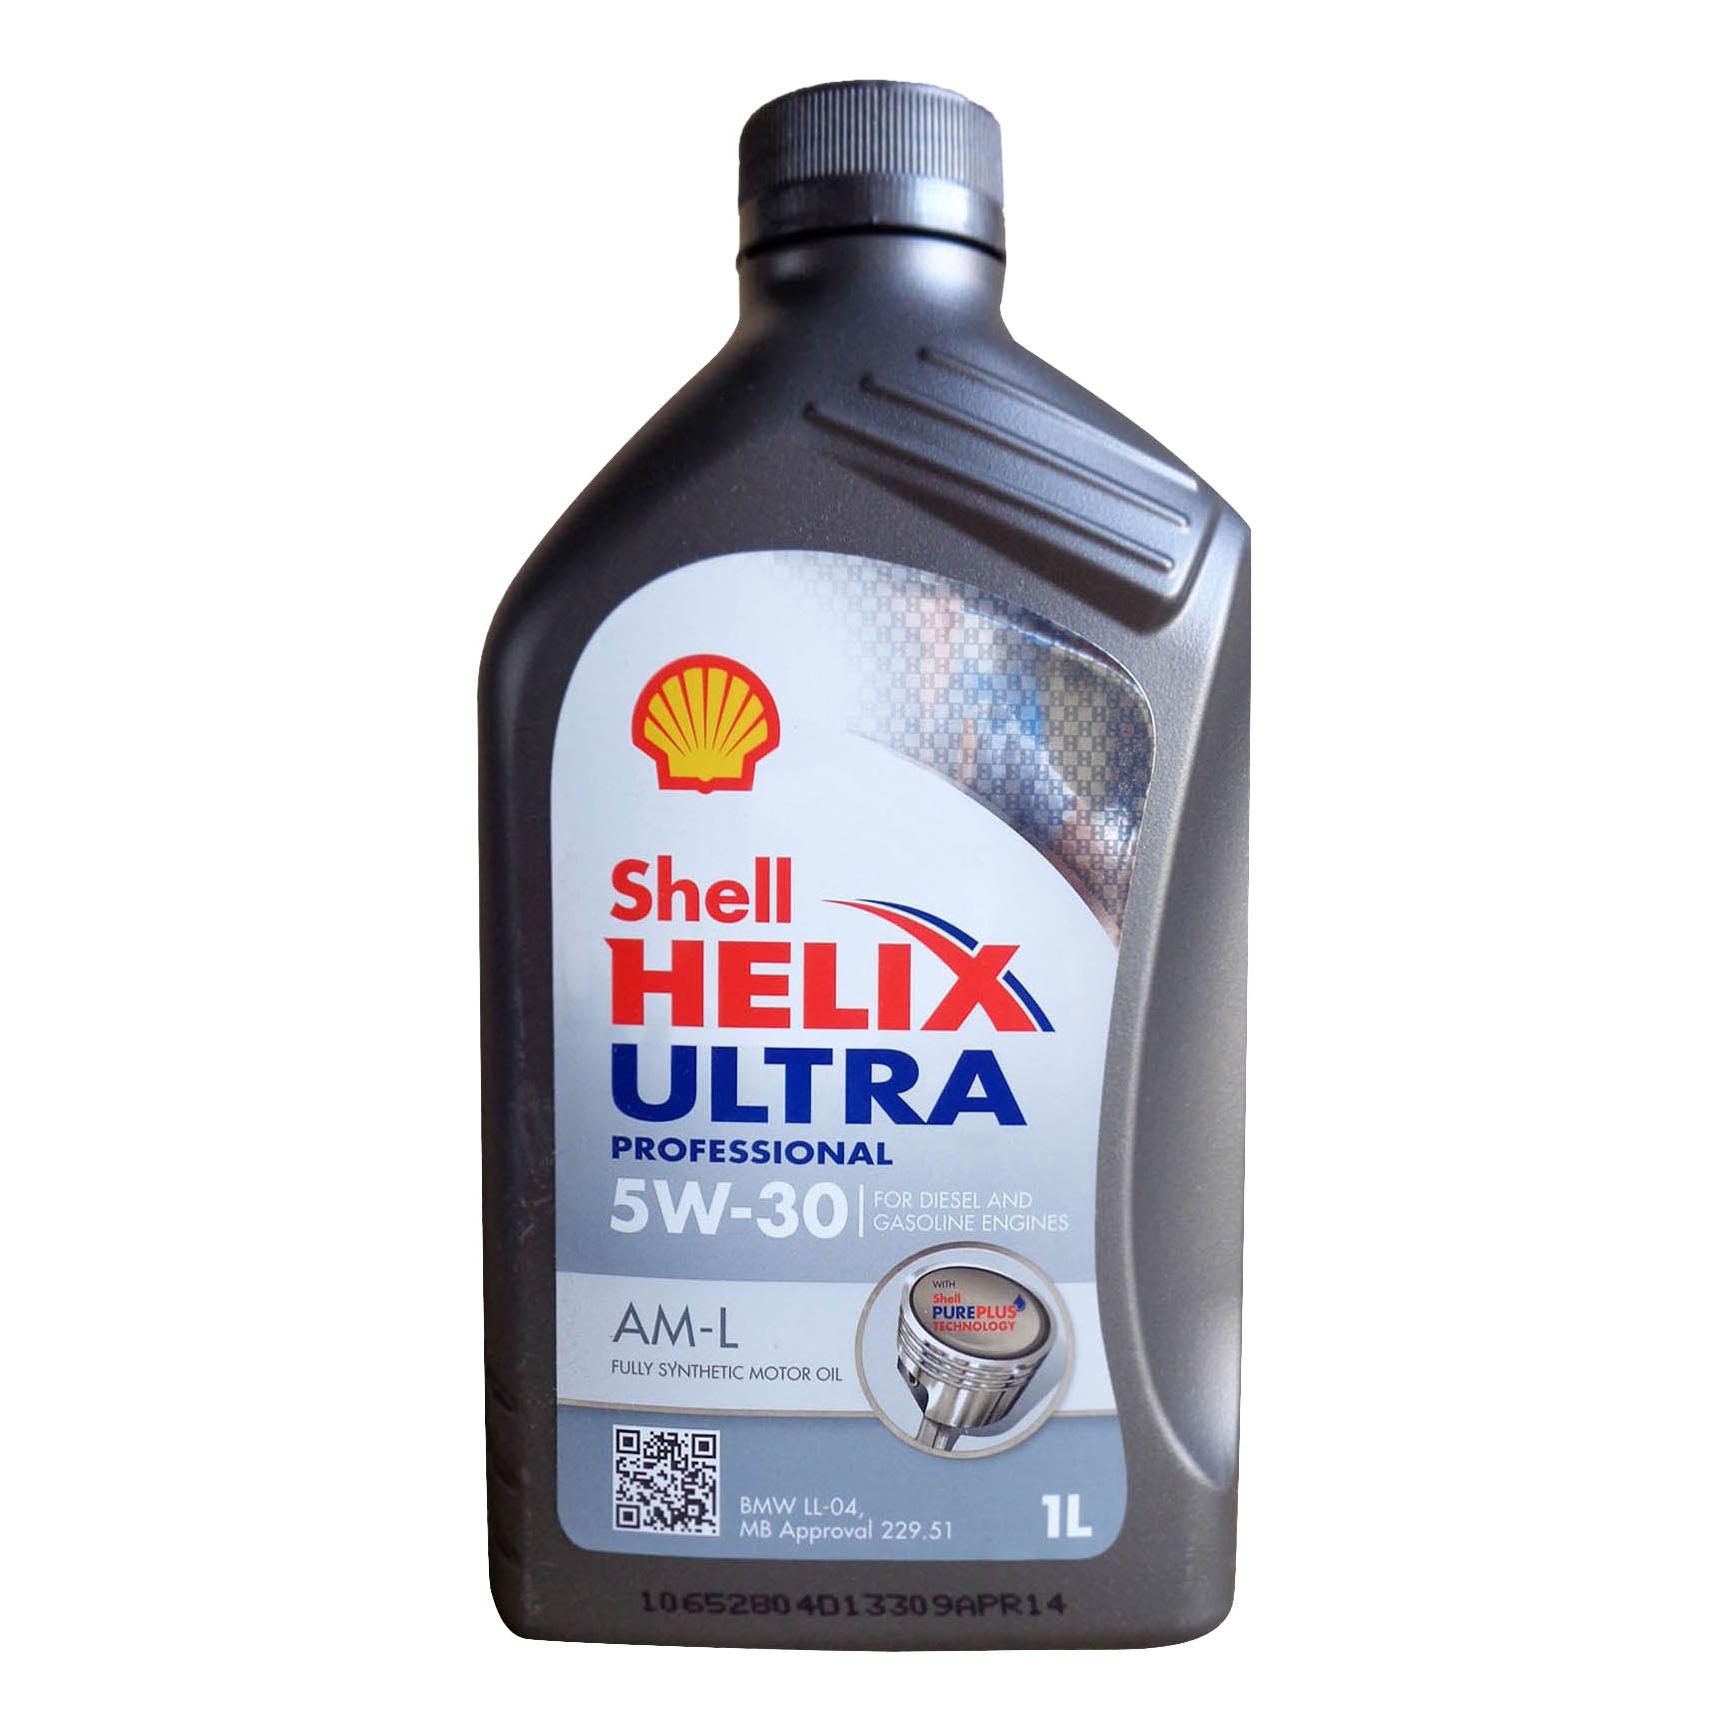 SHELL HELIX ULTRA PROFESSIONAL AM-L